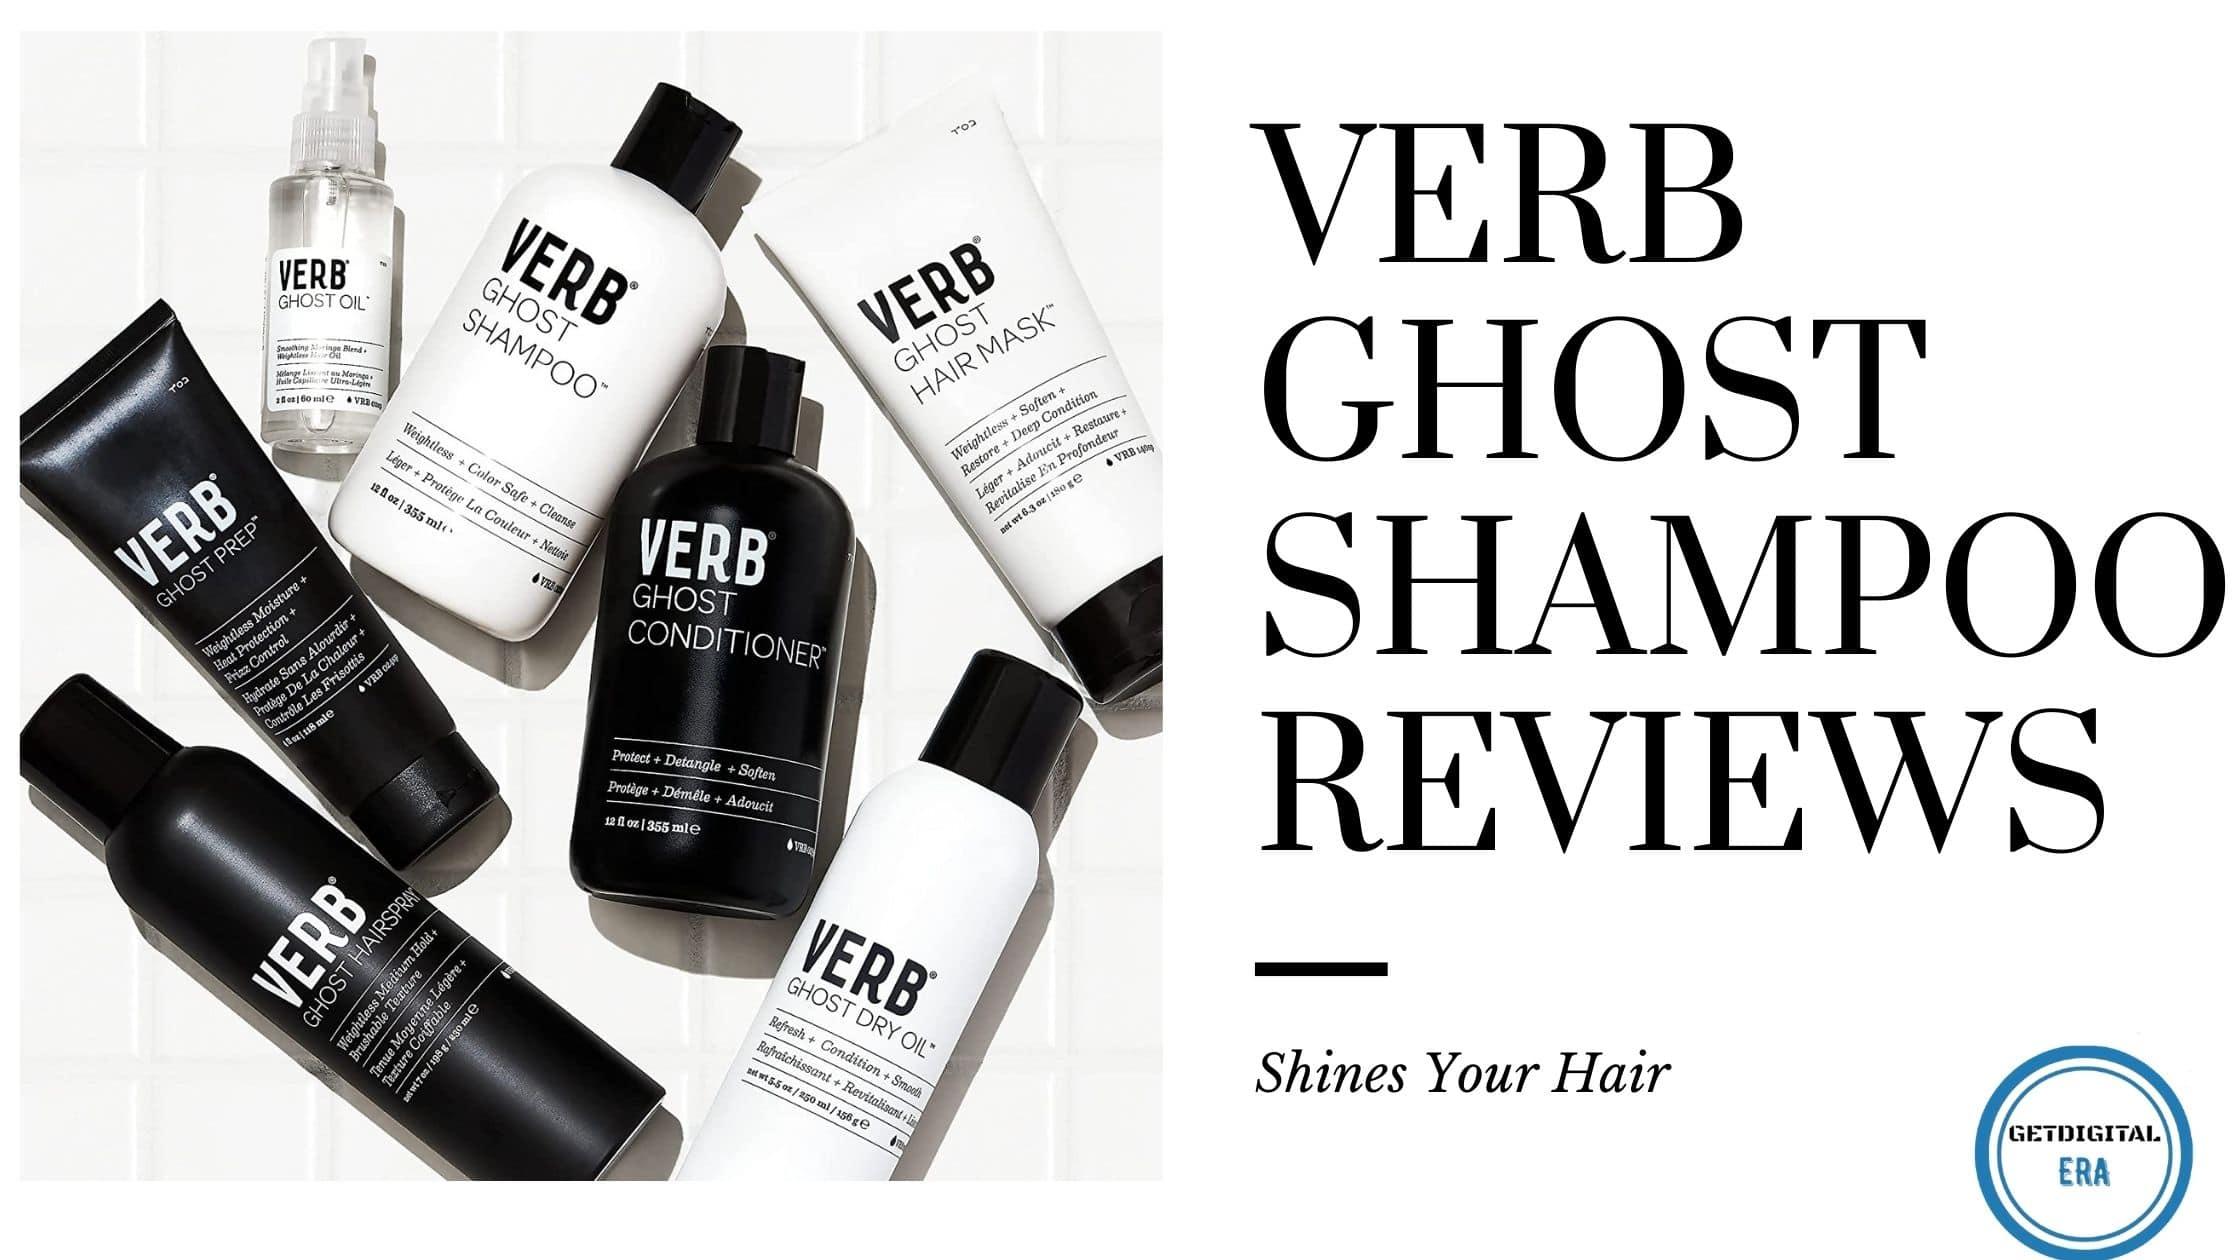 Verb Ghost Shampoo Reviews